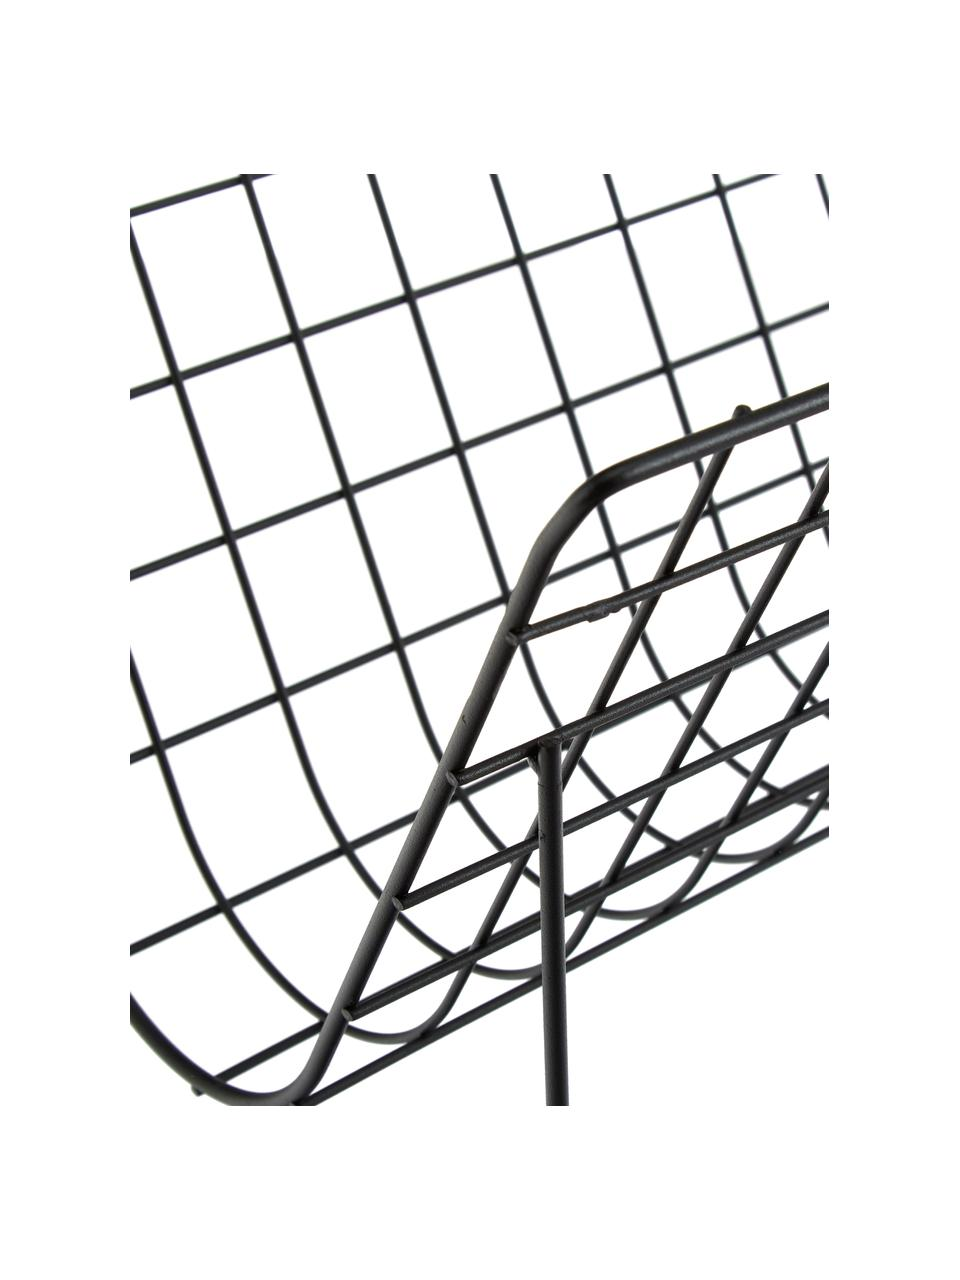 Portariviste Brando, Acciaio rivestito, Nero, Larg. 40 x Alt. 29 cm